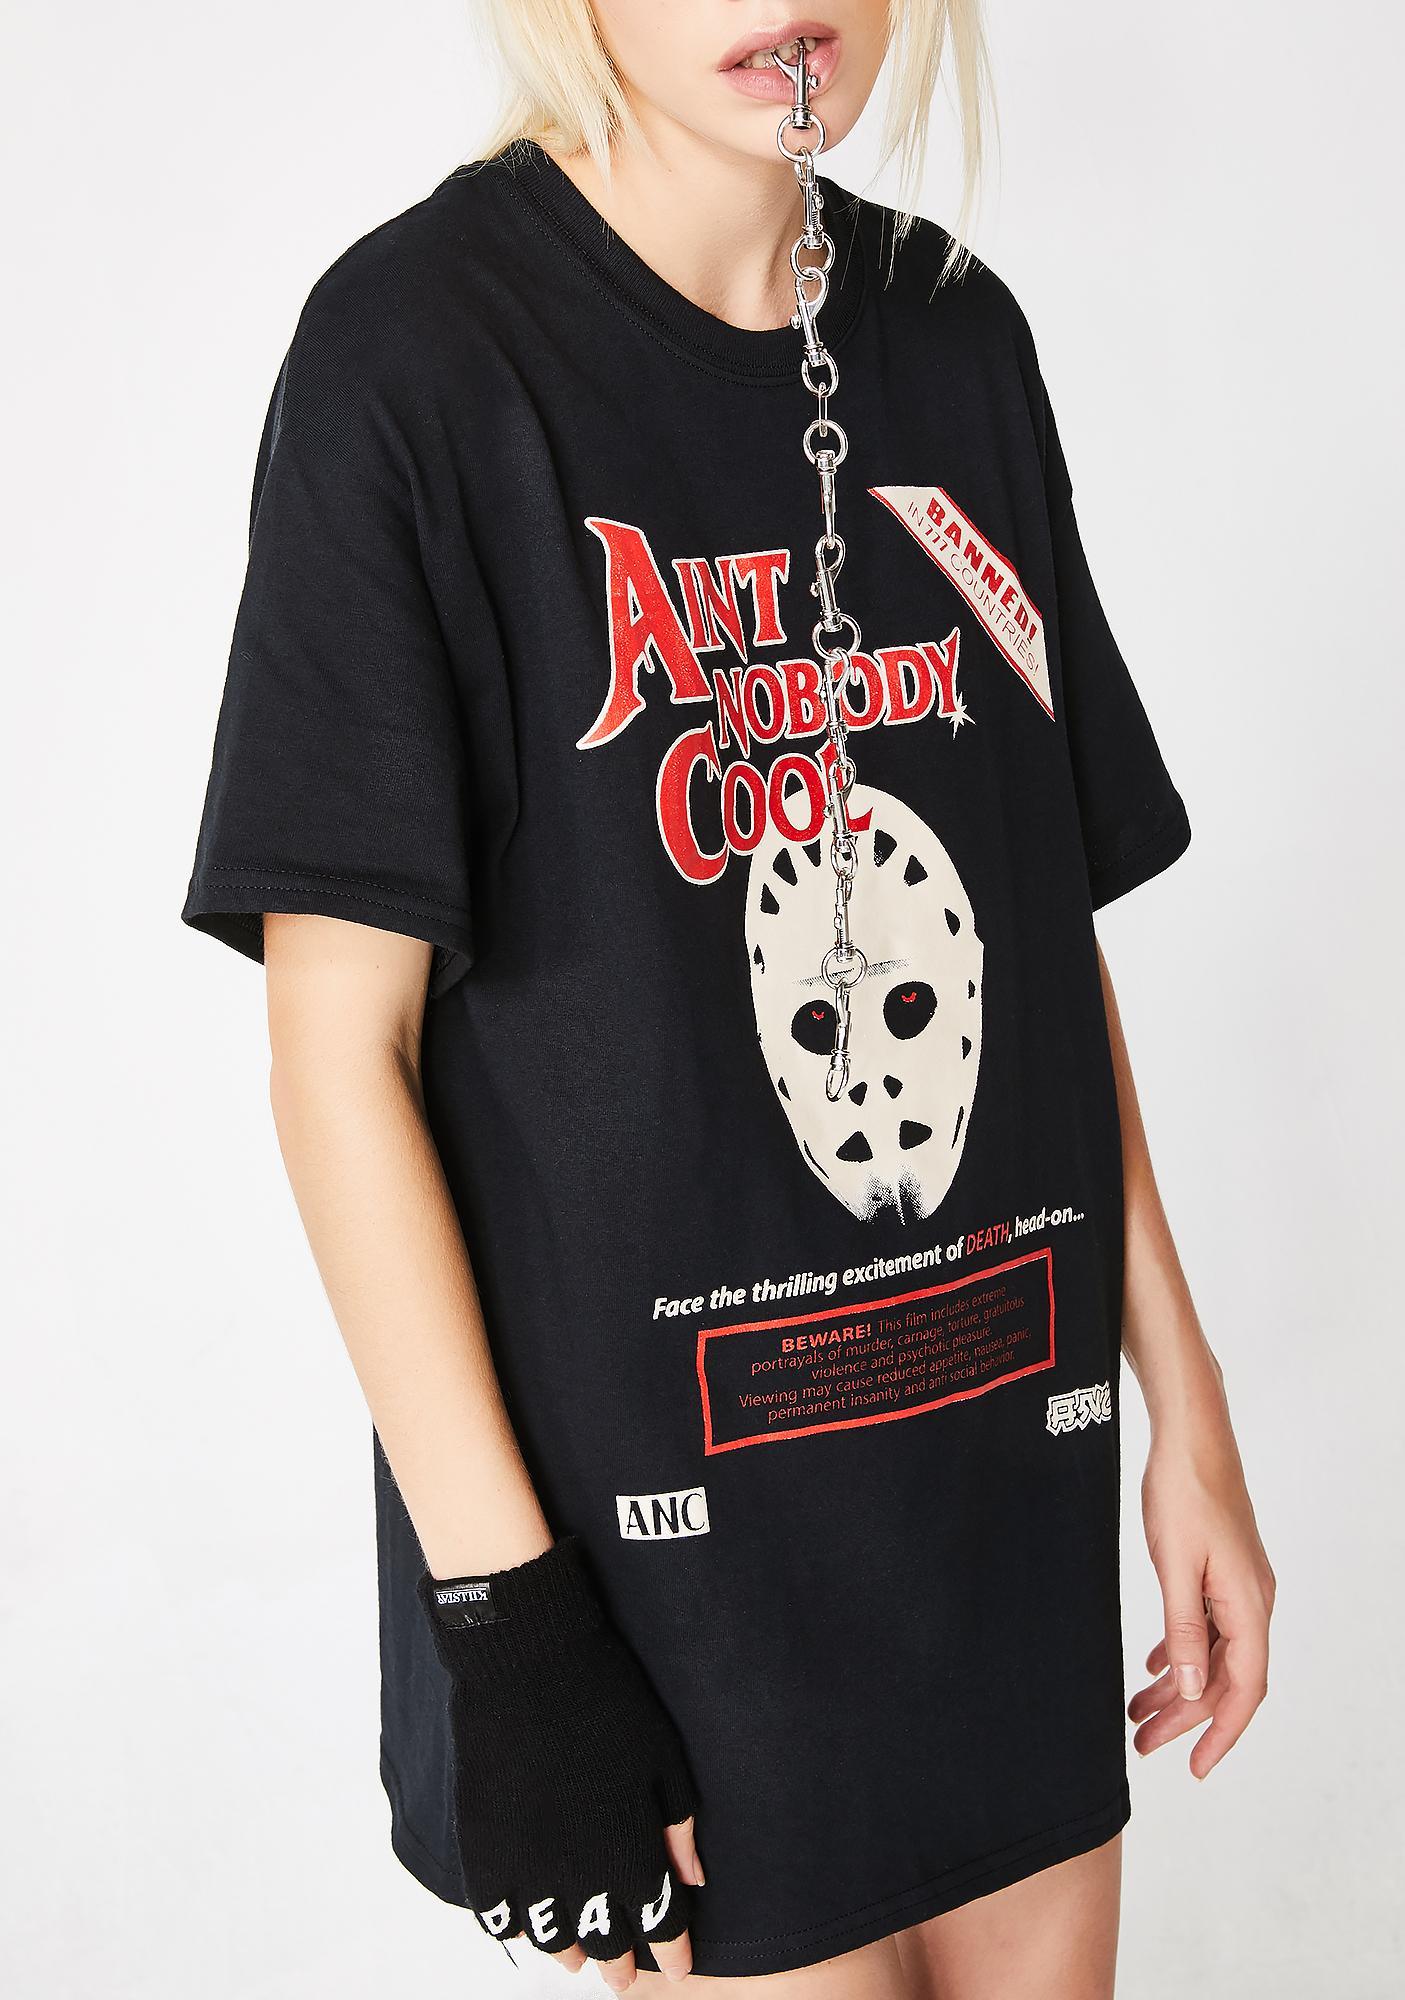 Ain't Nobody Cool Death Face Short Sleeve Tee